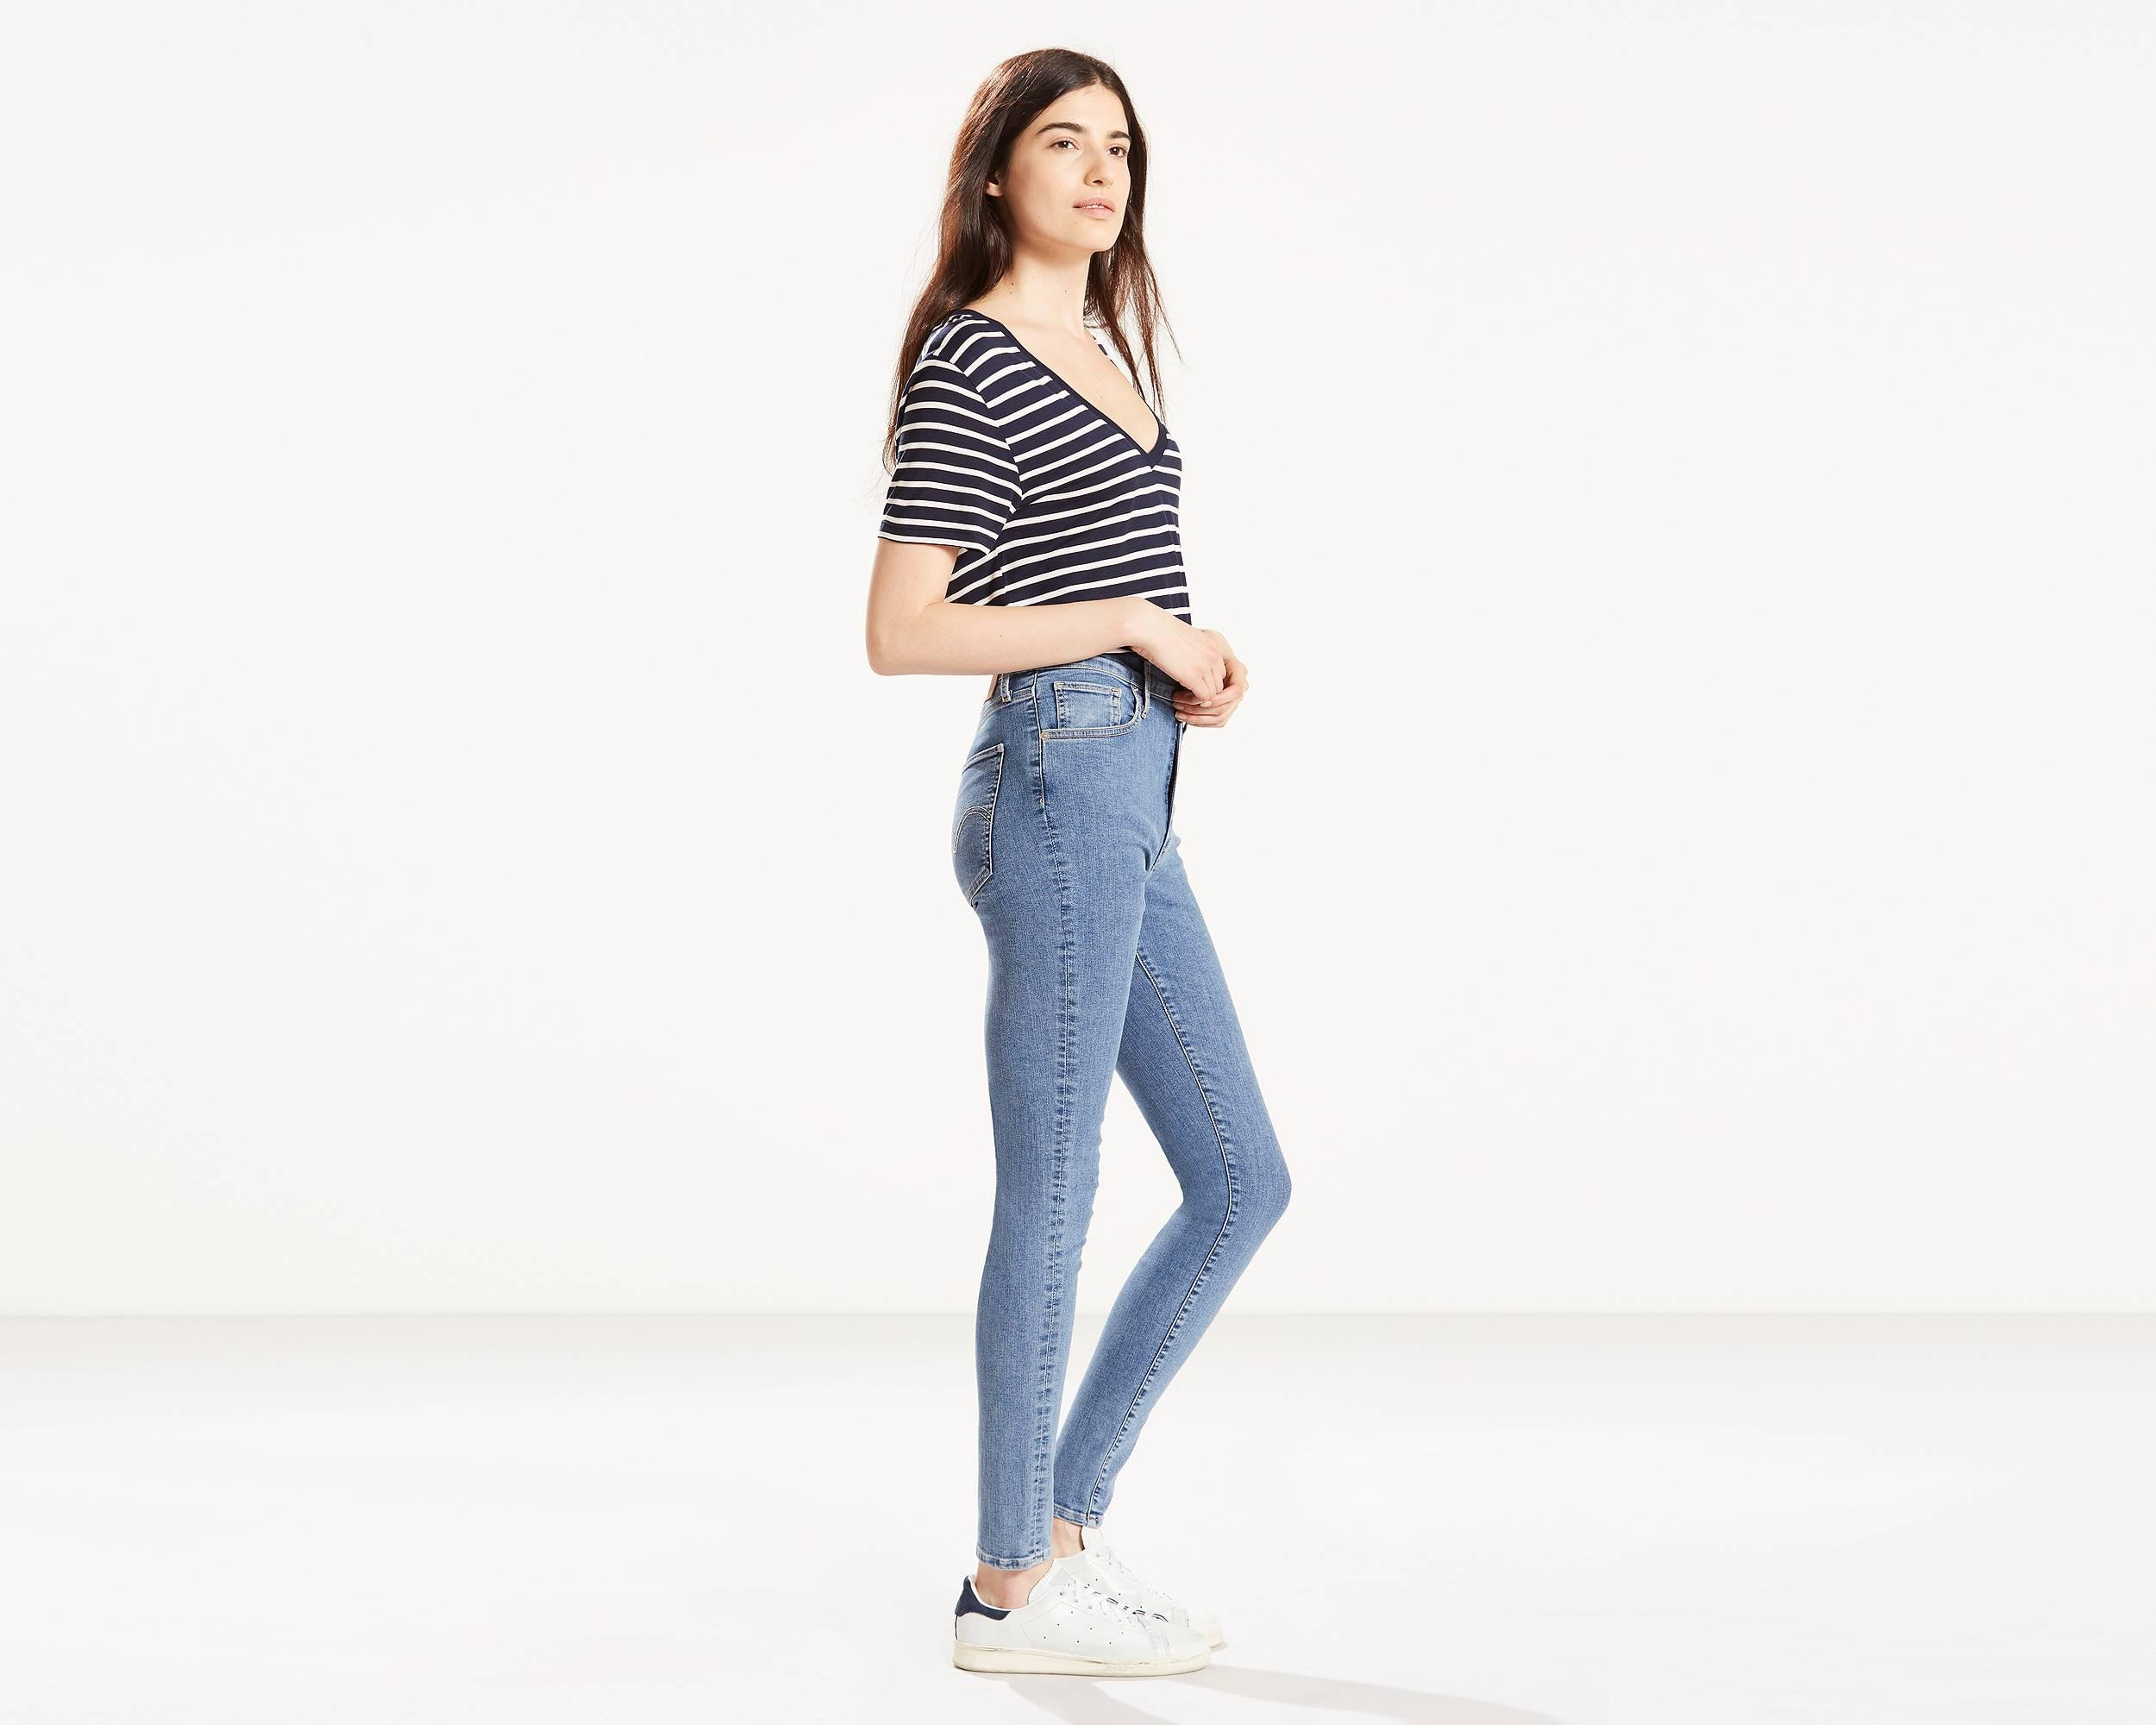 a3baf7c1 Mile High Super Skinny Jeans - Levi's Jeans, Jackets & Clothing